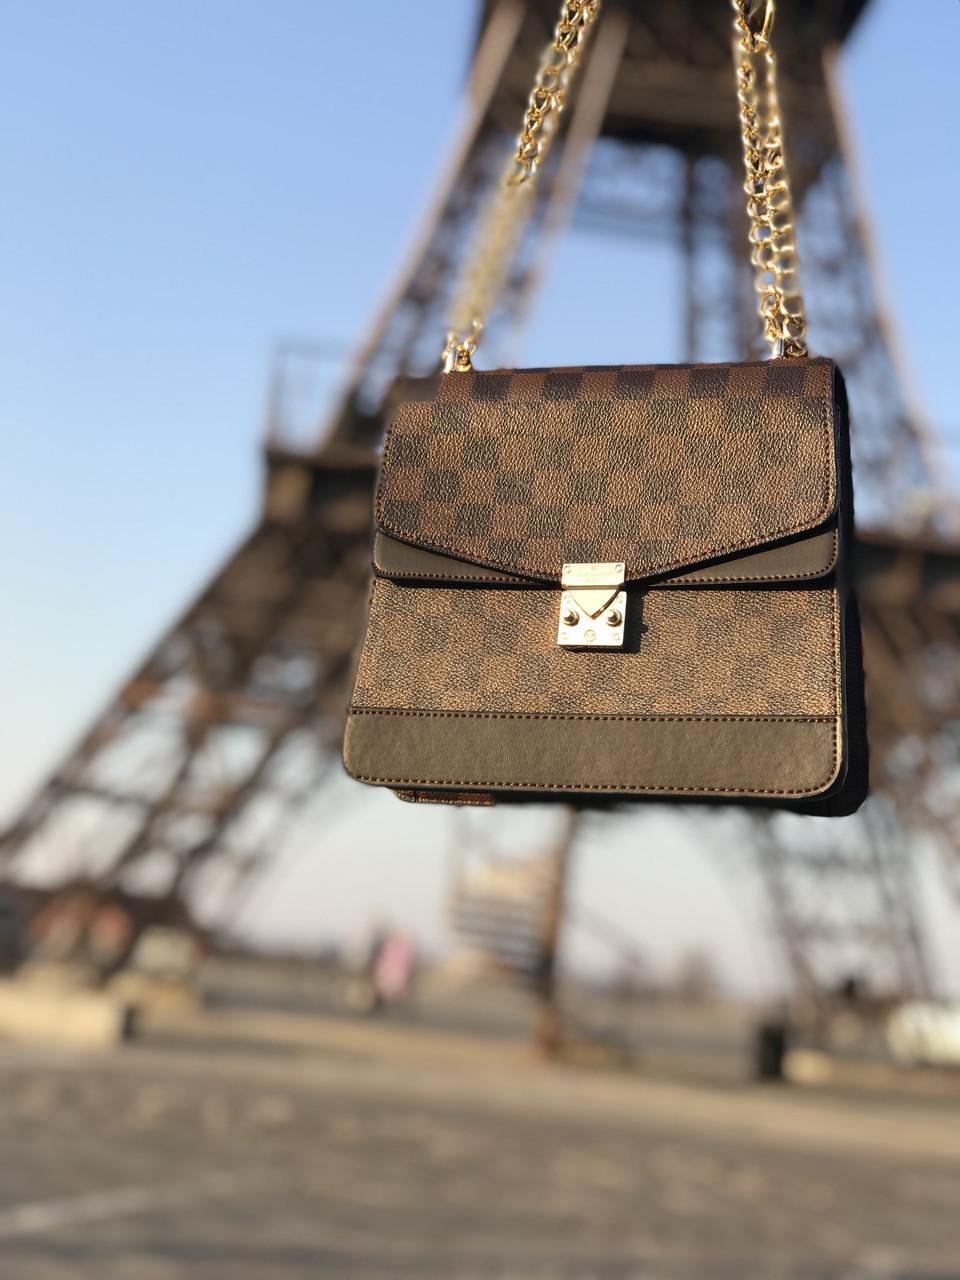 0921237e608 Сумка женская Louis Vuitton LV (реплика люкс) mini brown